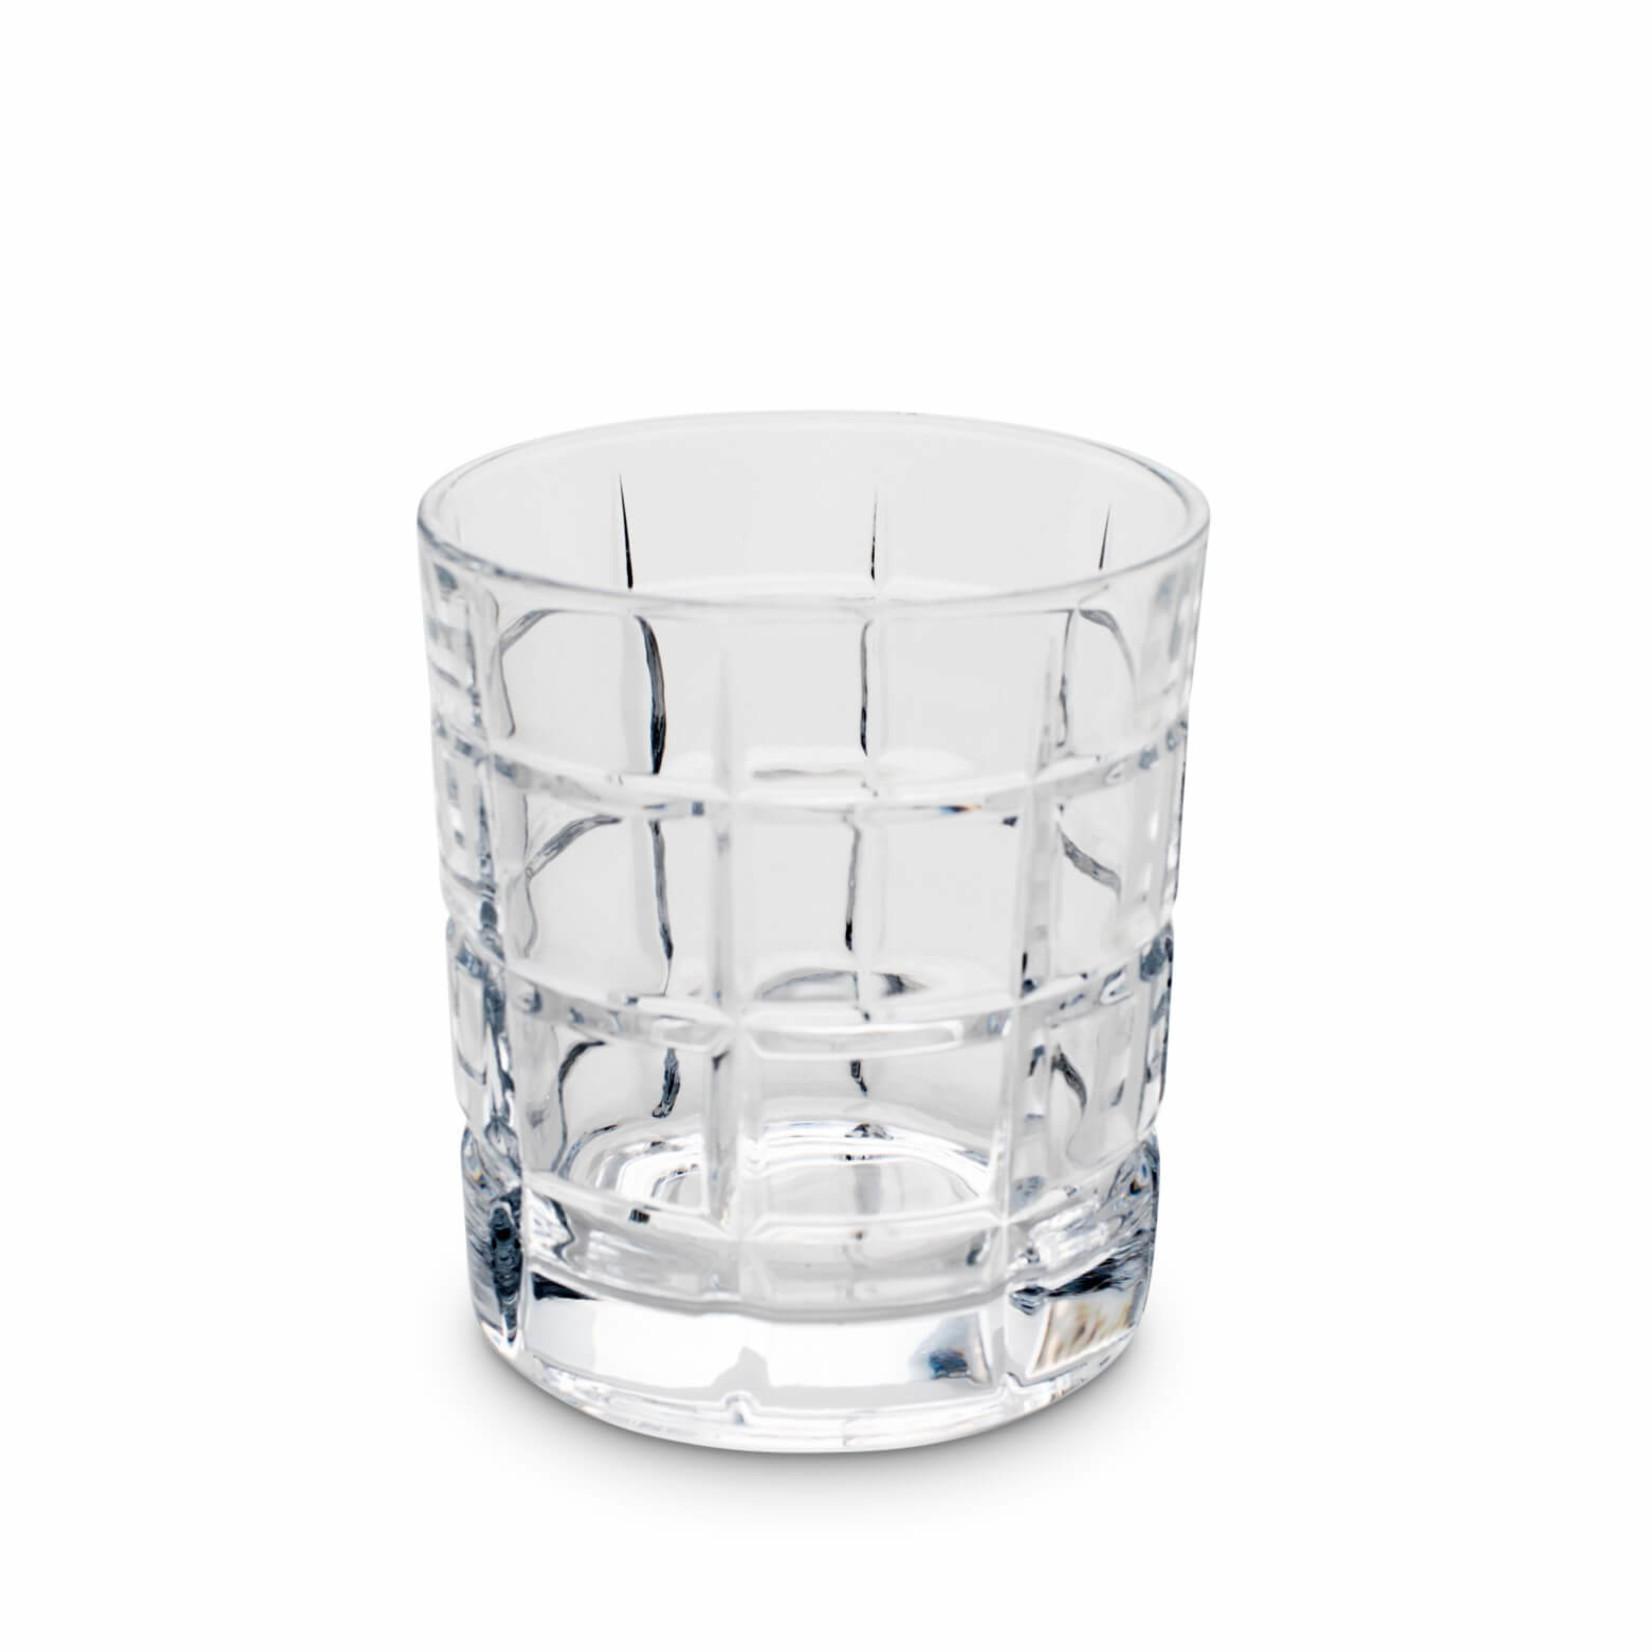 Rothko Double Rocks Glass Set